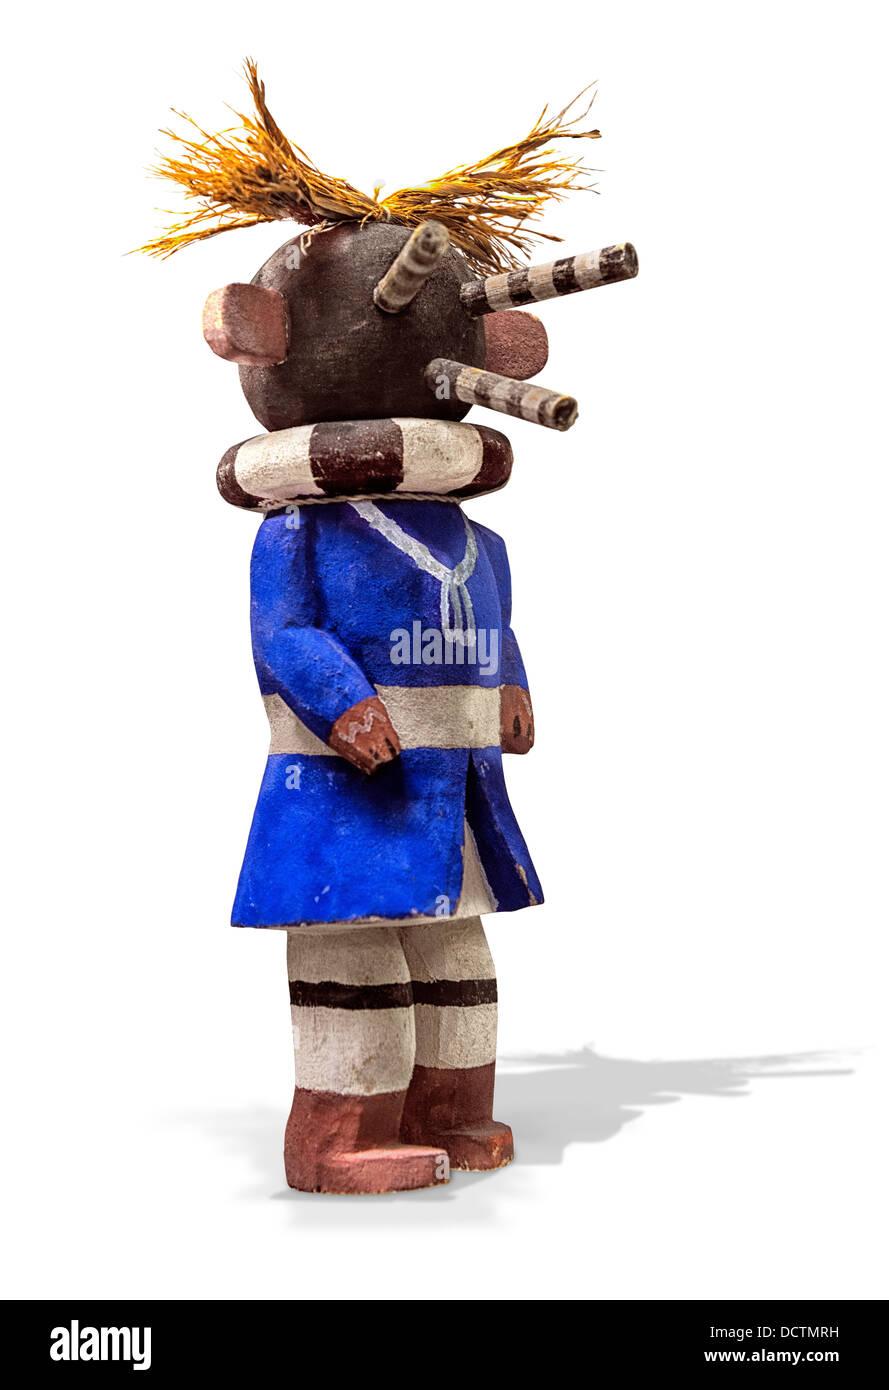 A Hopi  Mocking Katsina Kachina doll. His purpose is to comment on improper social behavior. By mocking other dancers. - Stock Image